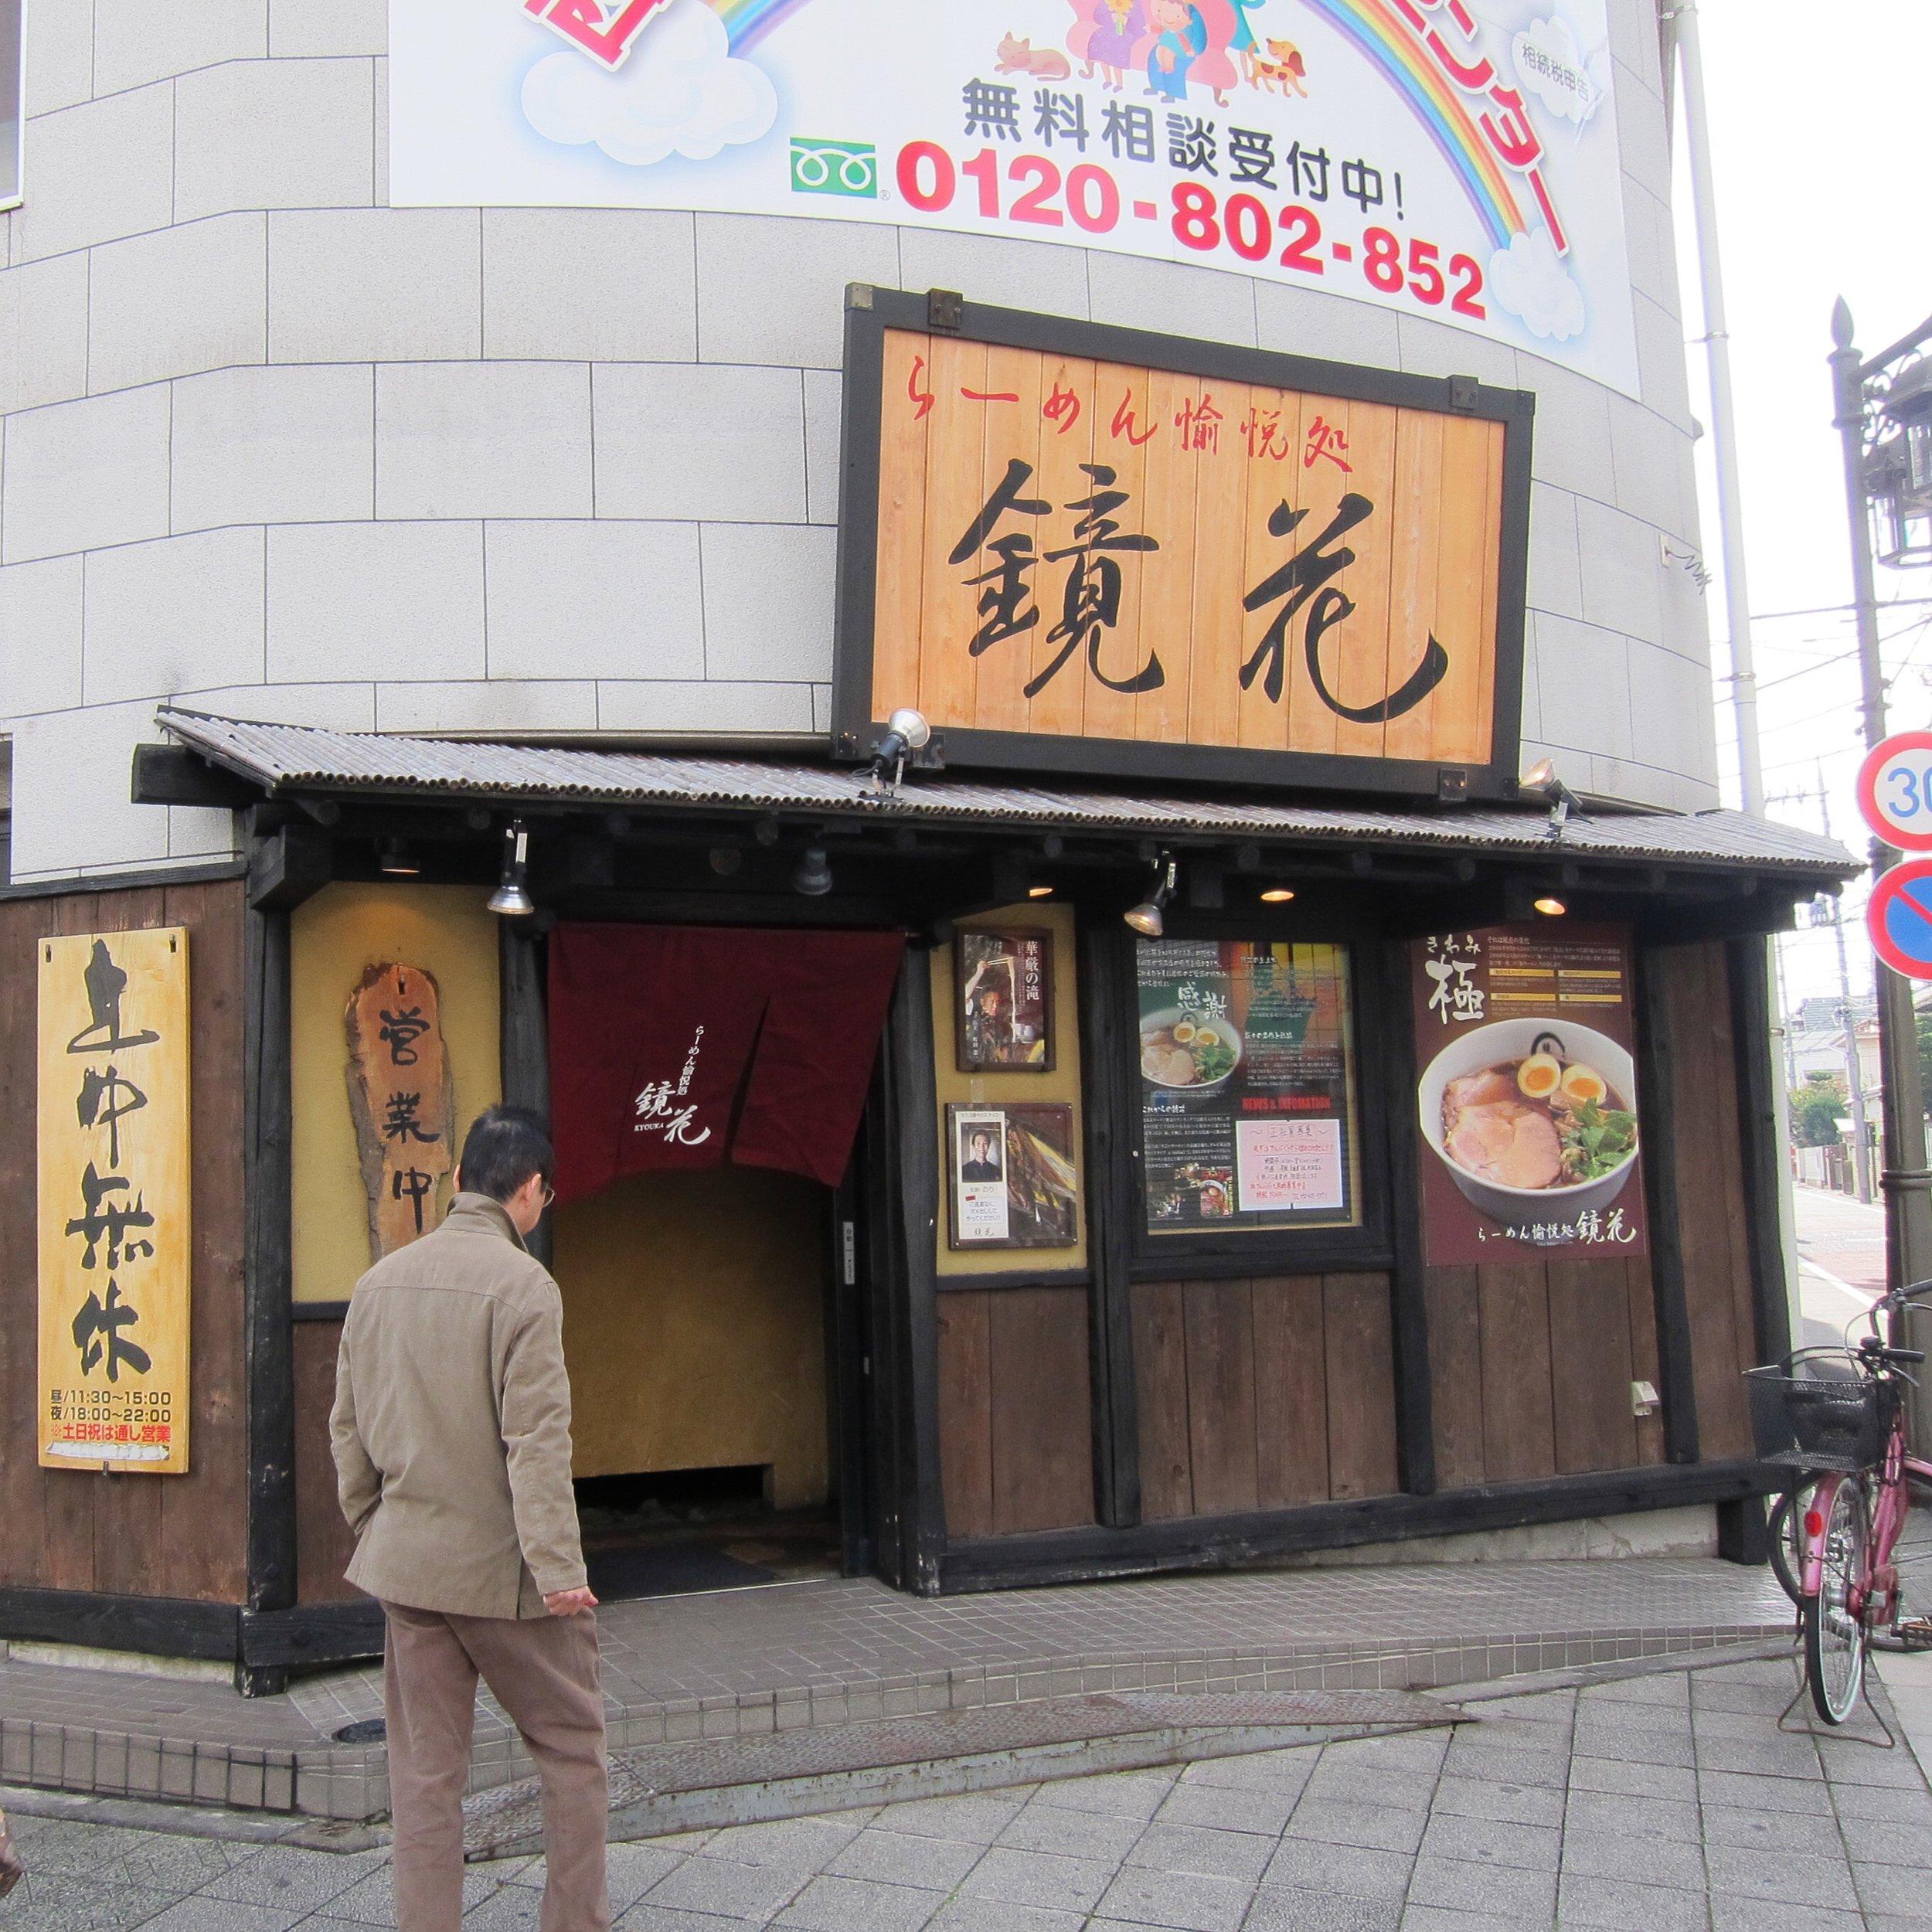 Kyouka Shop Abram.JPG